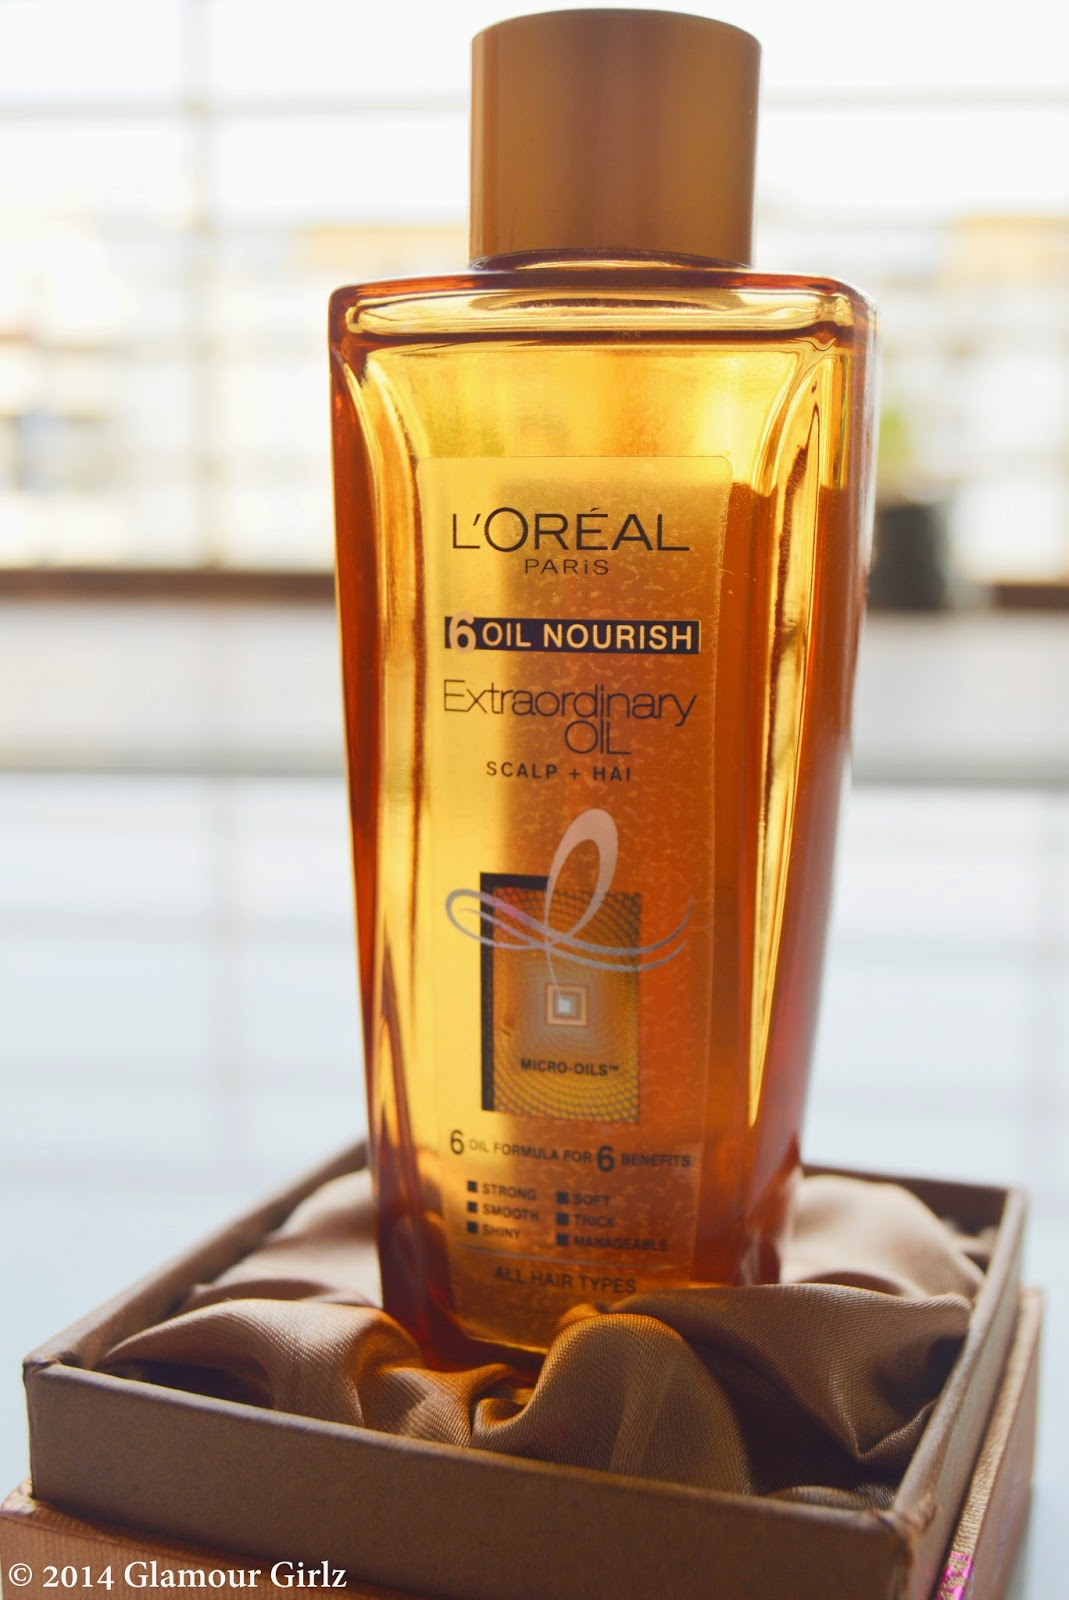 L'Oreal Paris 6 Oil Nourish Extraordinary Oil- Review